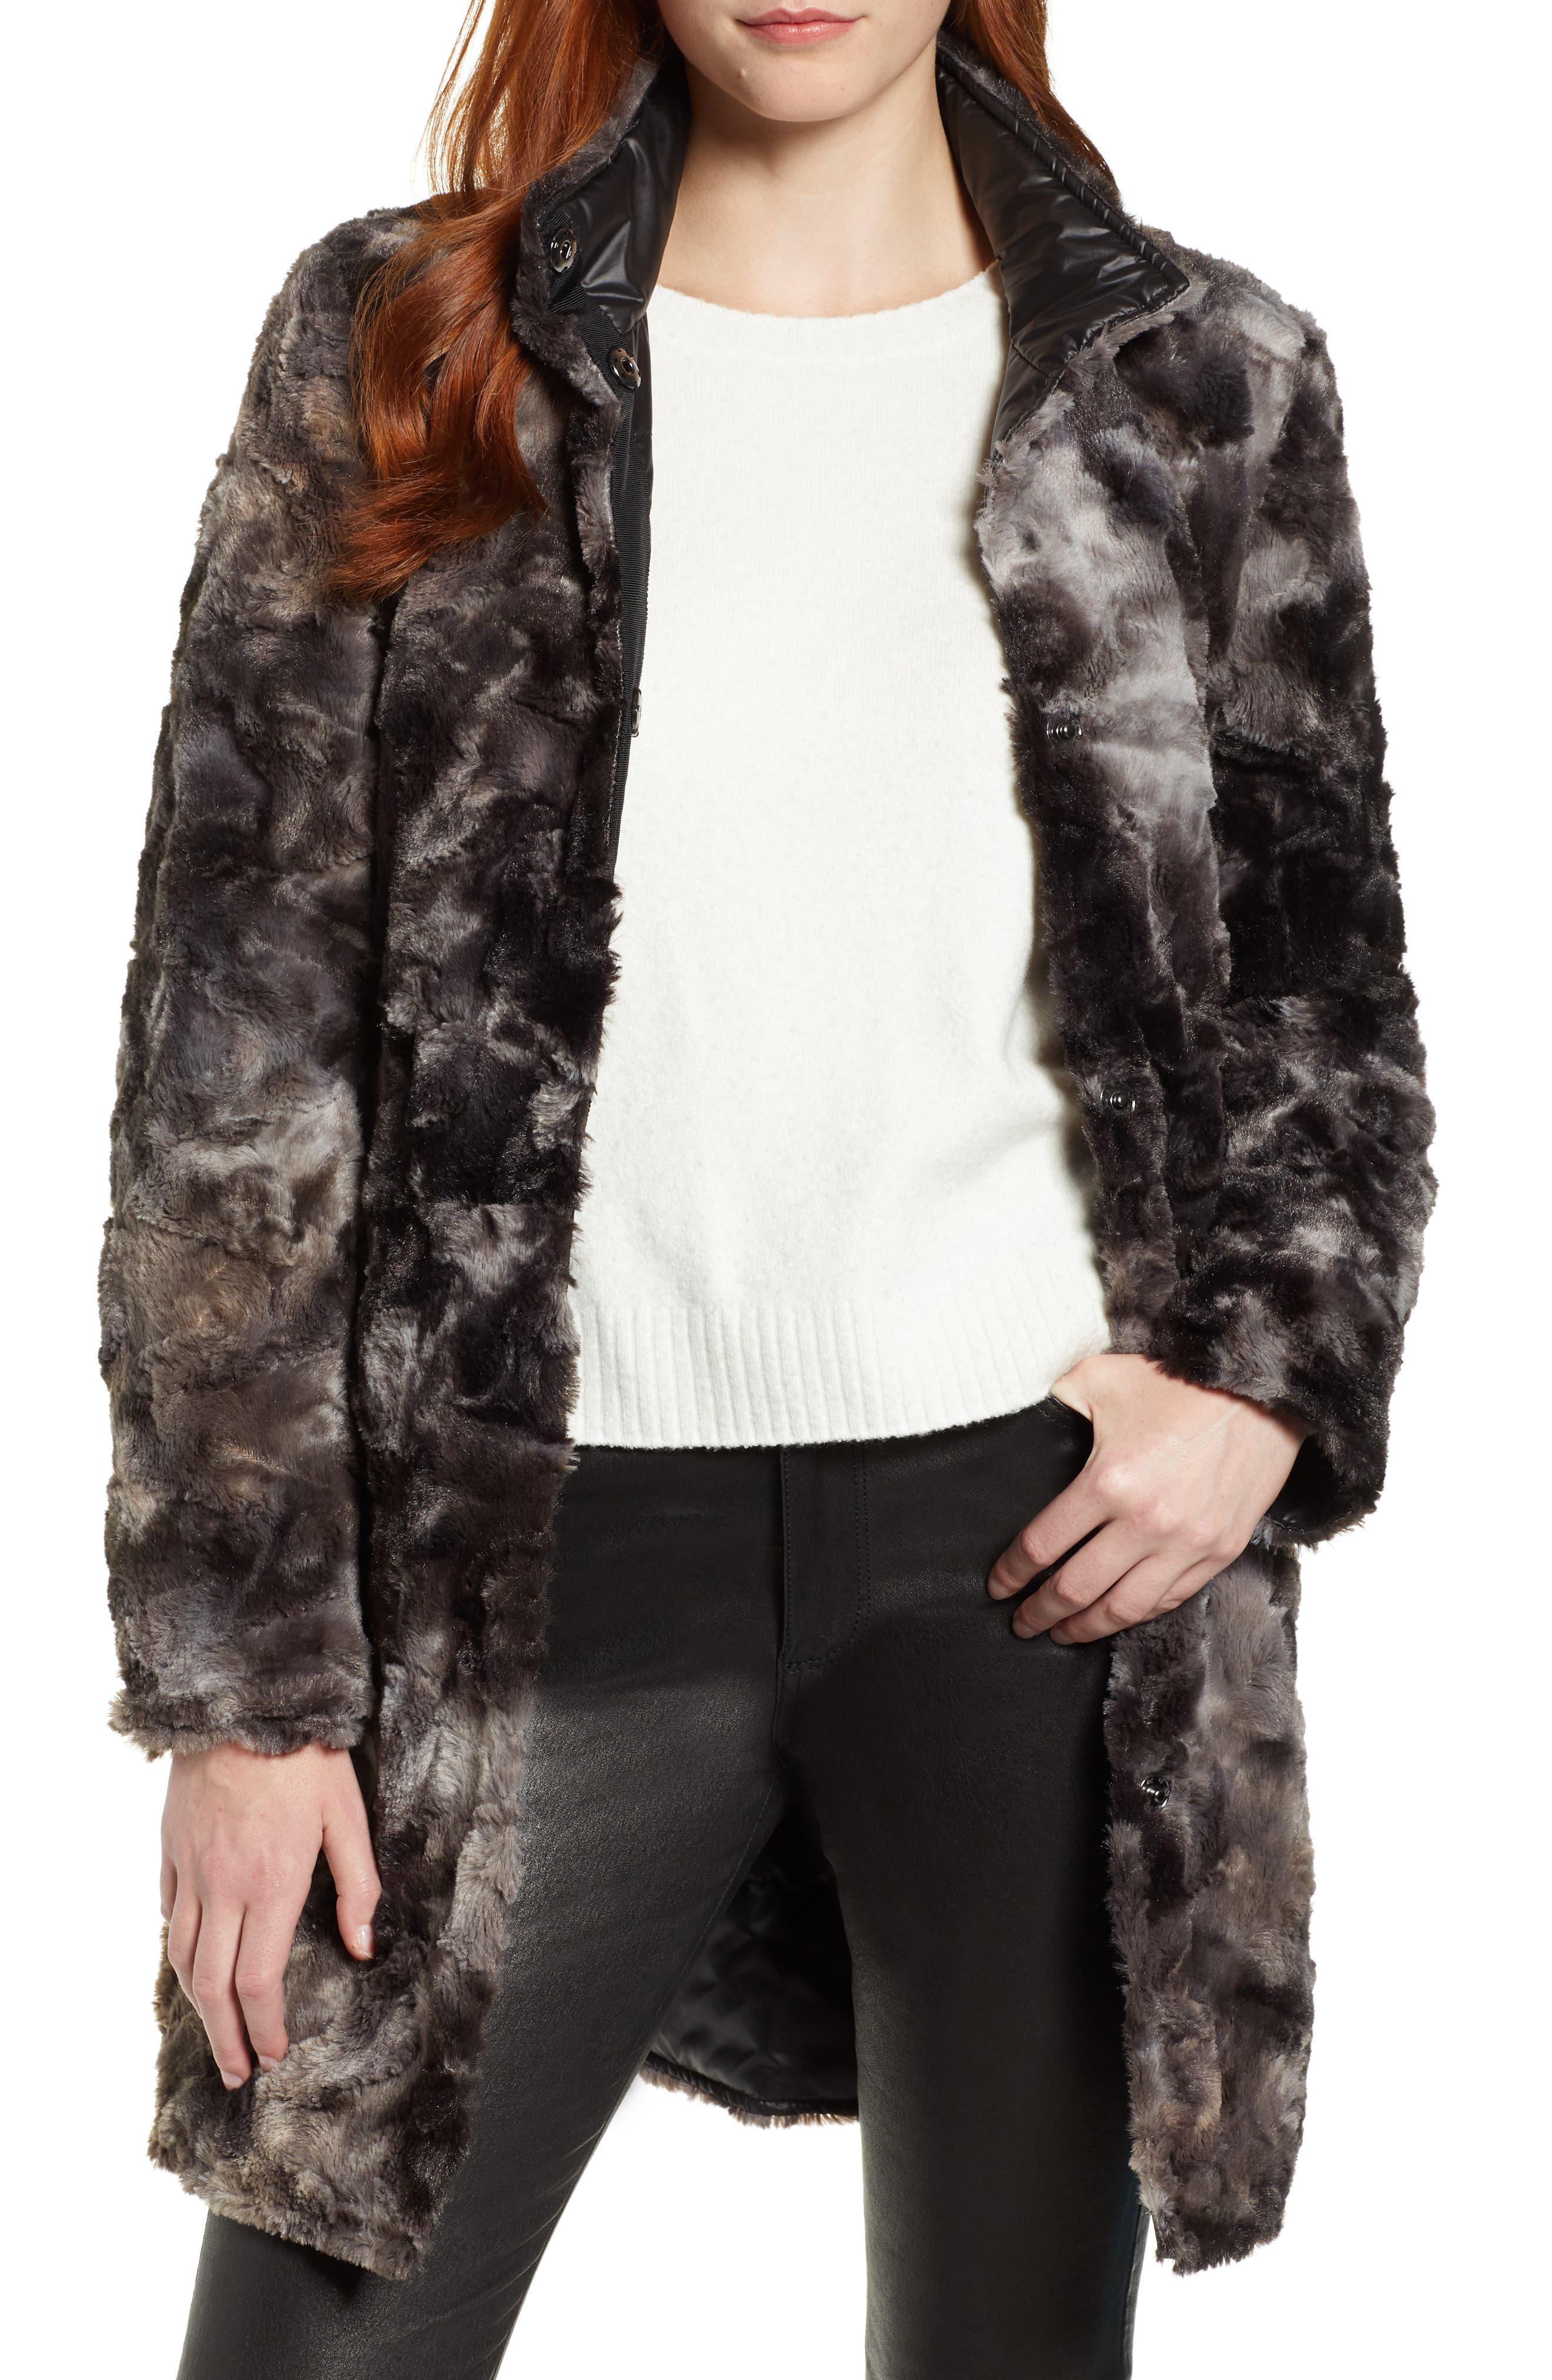 Reversible Faux Leopard Fur Coat,                             Main thumbnail 1, color,                             MARLED